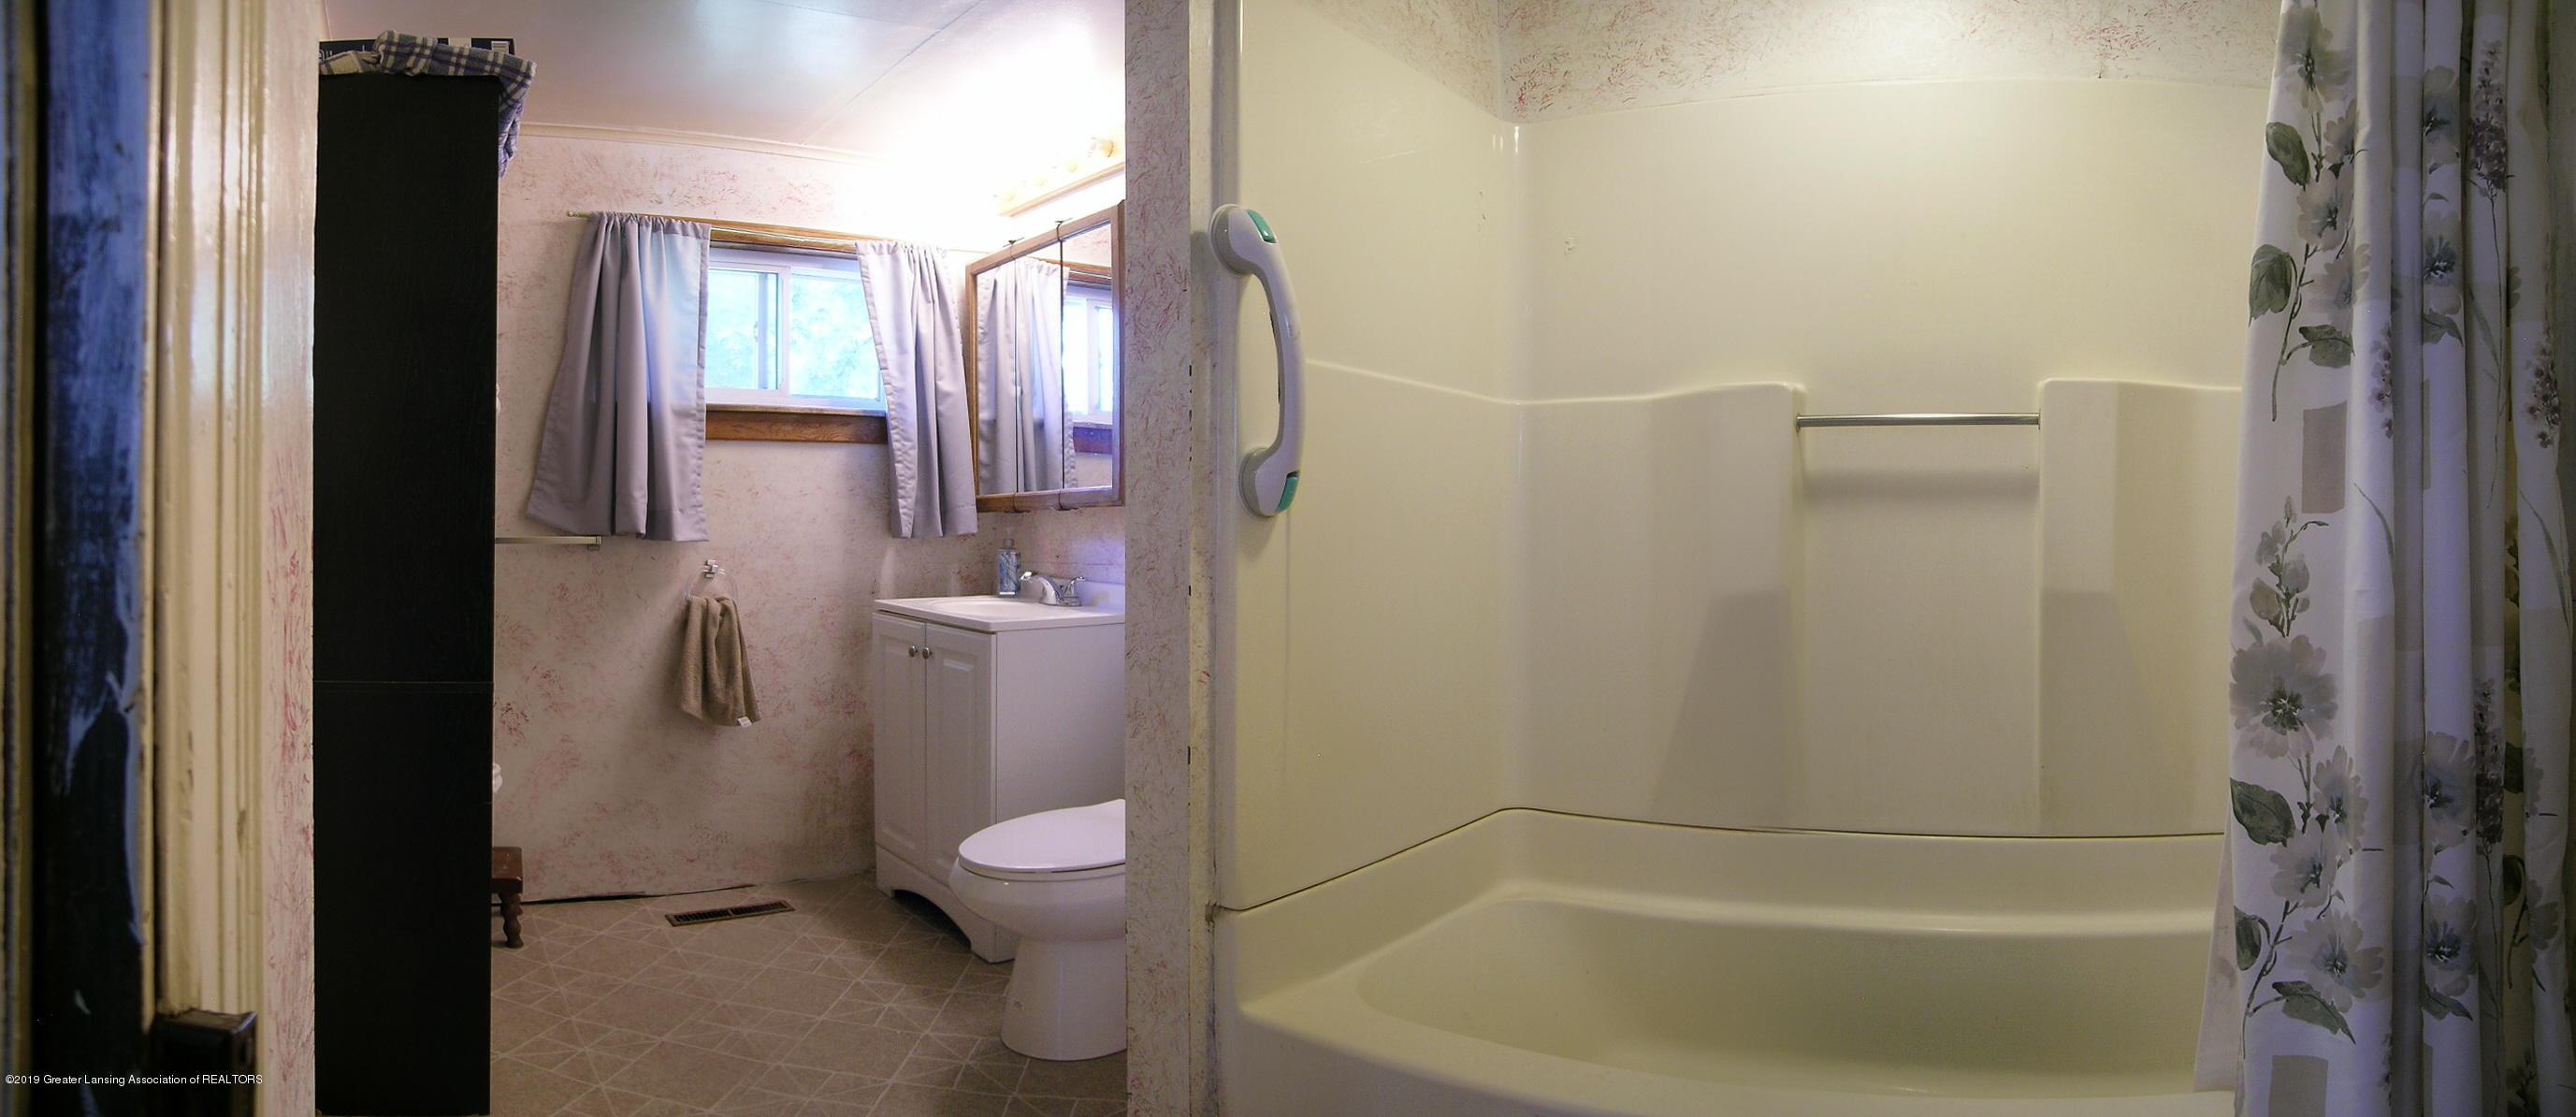 413 W Shepherd St - 11 Bathroom - 11